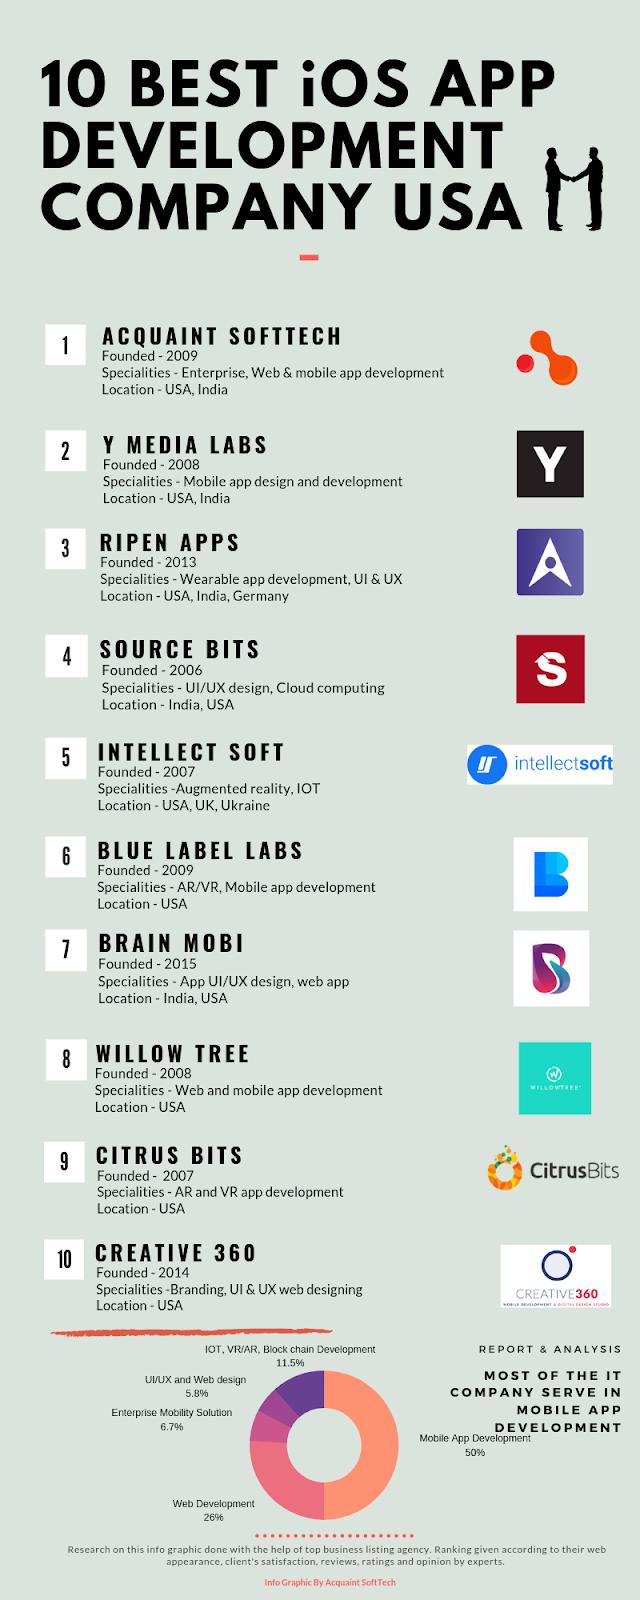 Top 10 iOS App Development Company USA